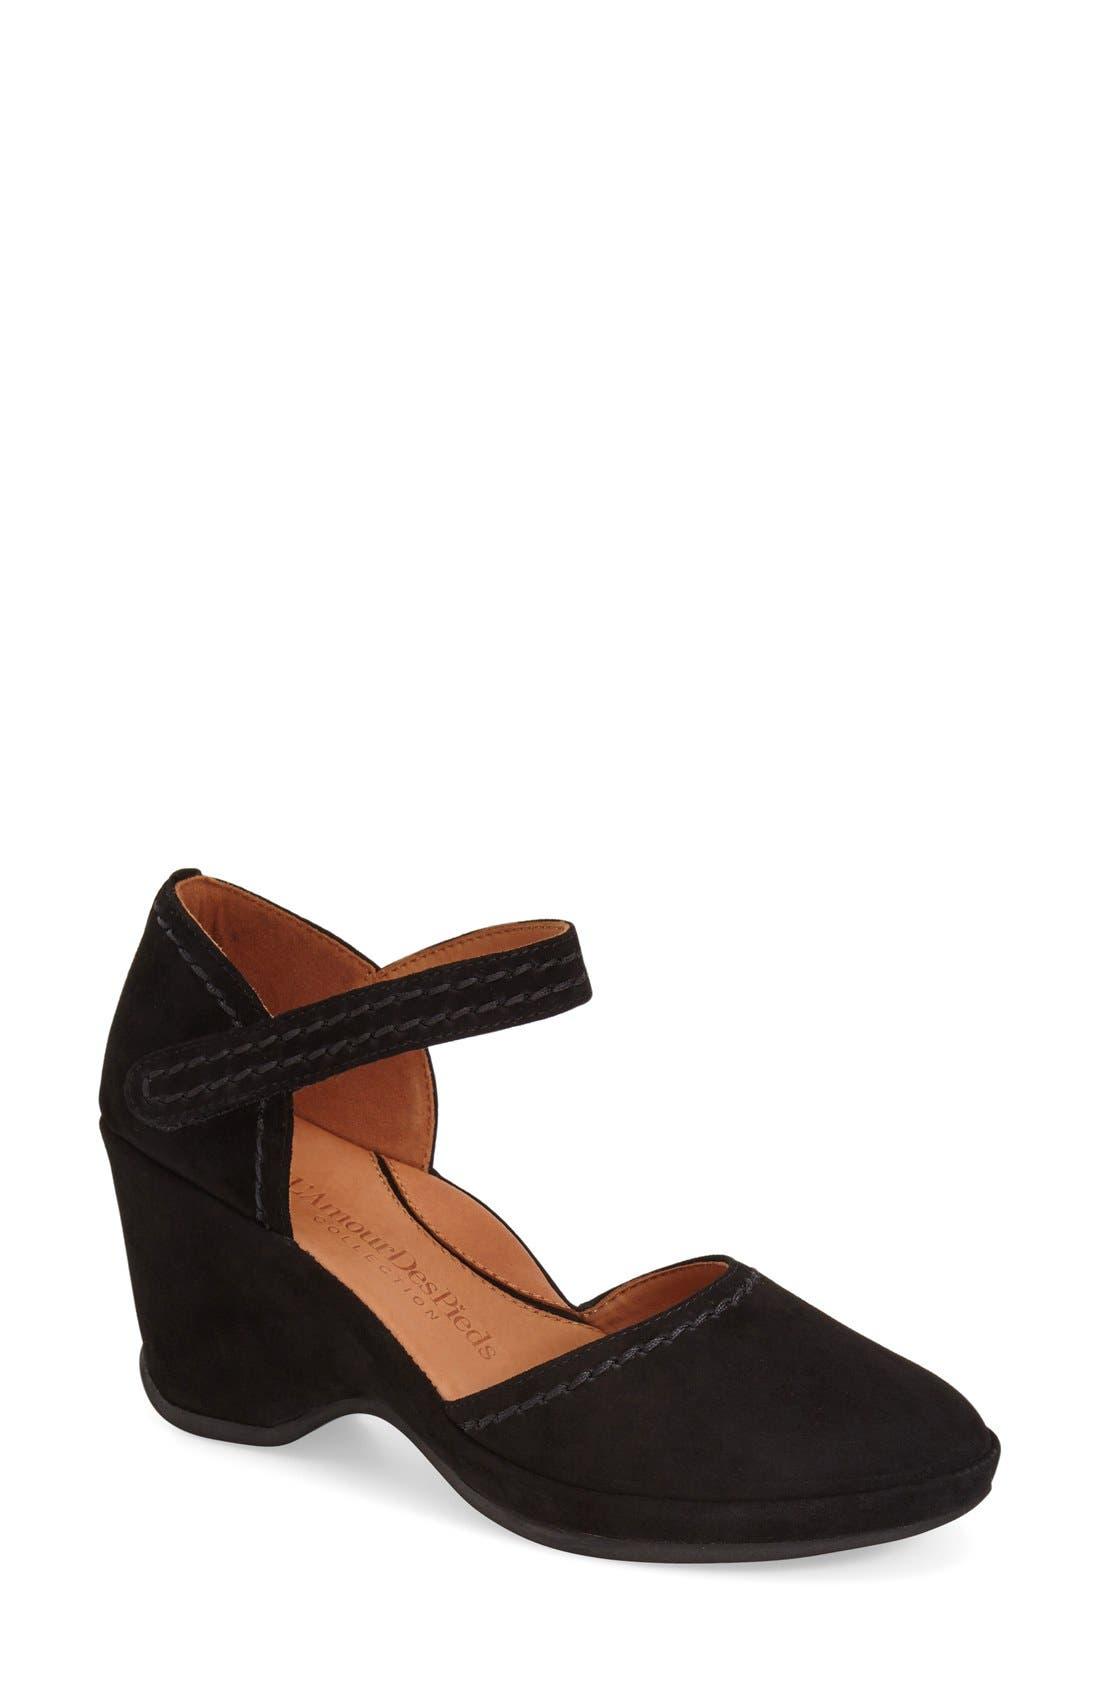 L'Amourdes Pieds'Orva' Wedge Sandal (Women)